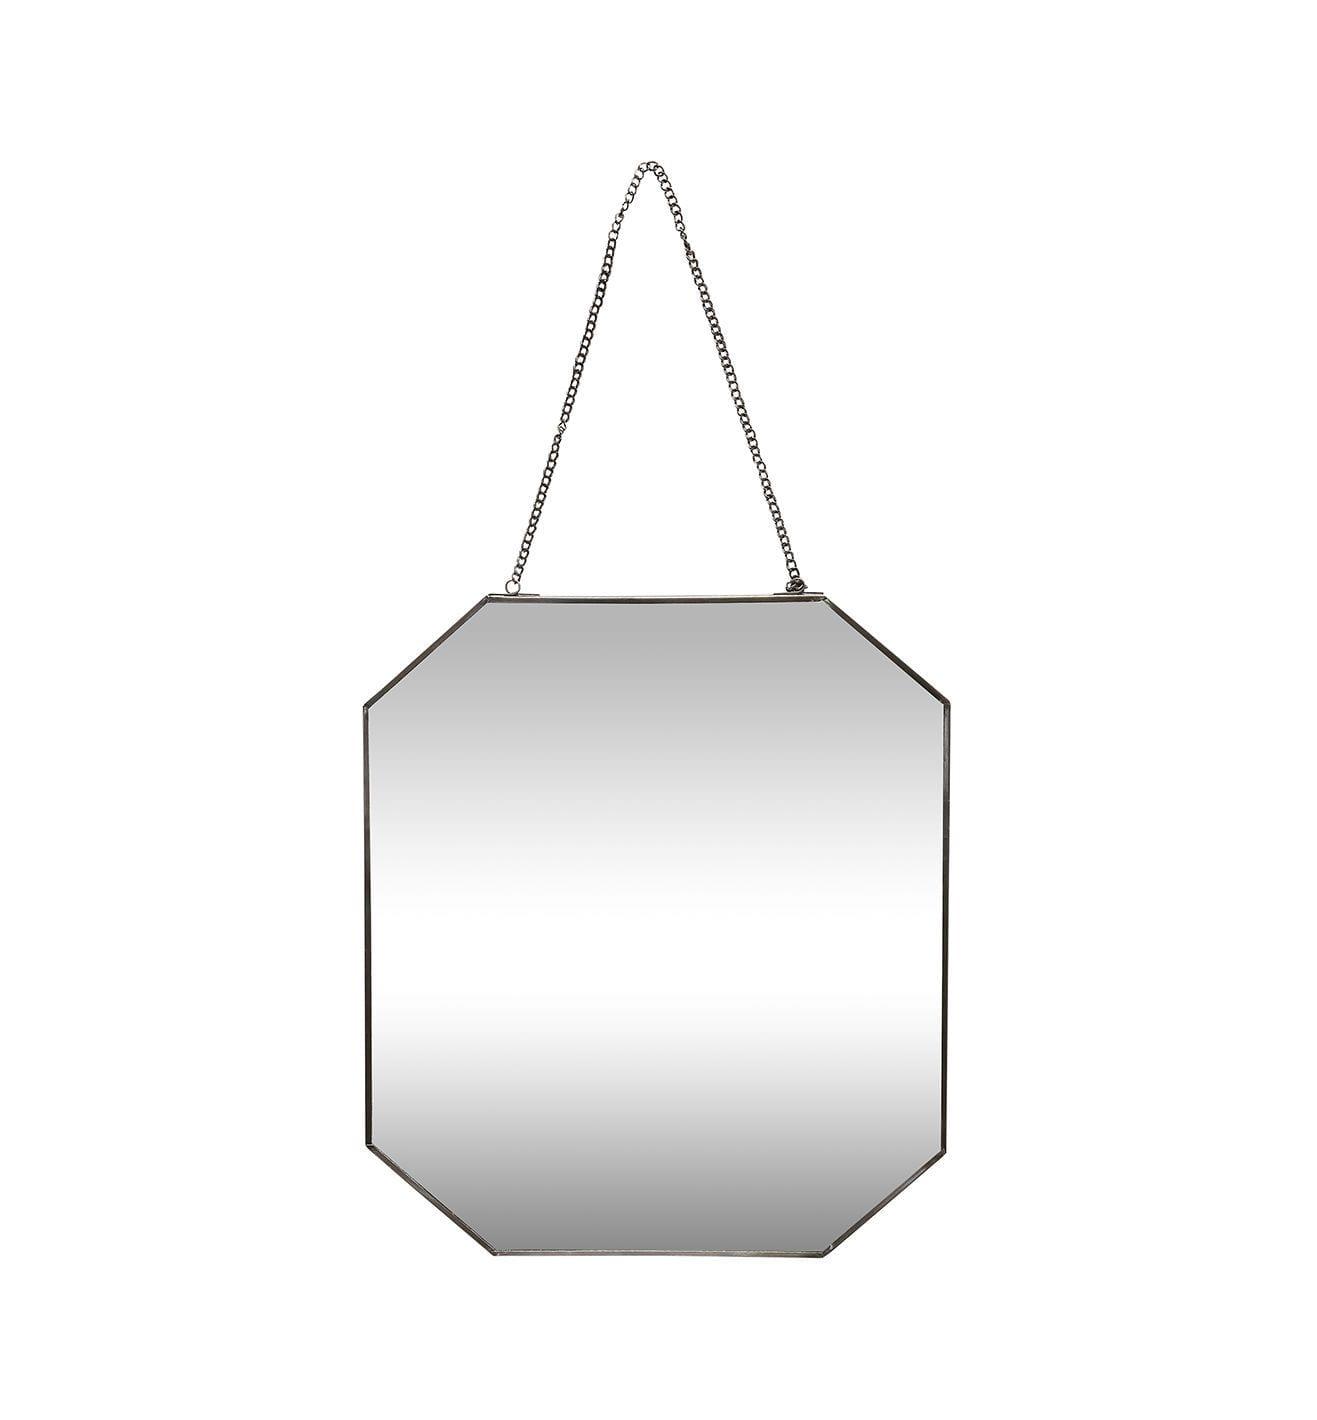 Miroir octogonal - M